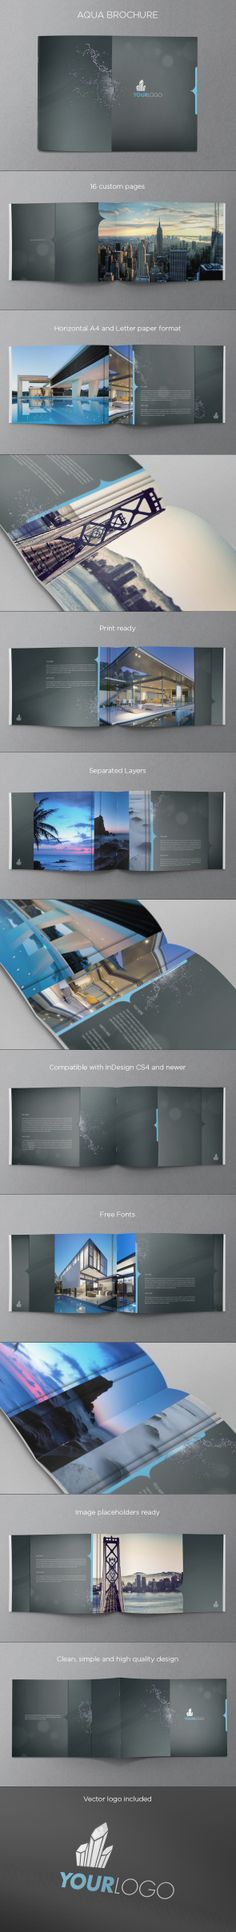 Aqua Premium Brochure. Download here: http://graphicriver.net/item/aqua-premium-brochure/4646509 #design #brochure